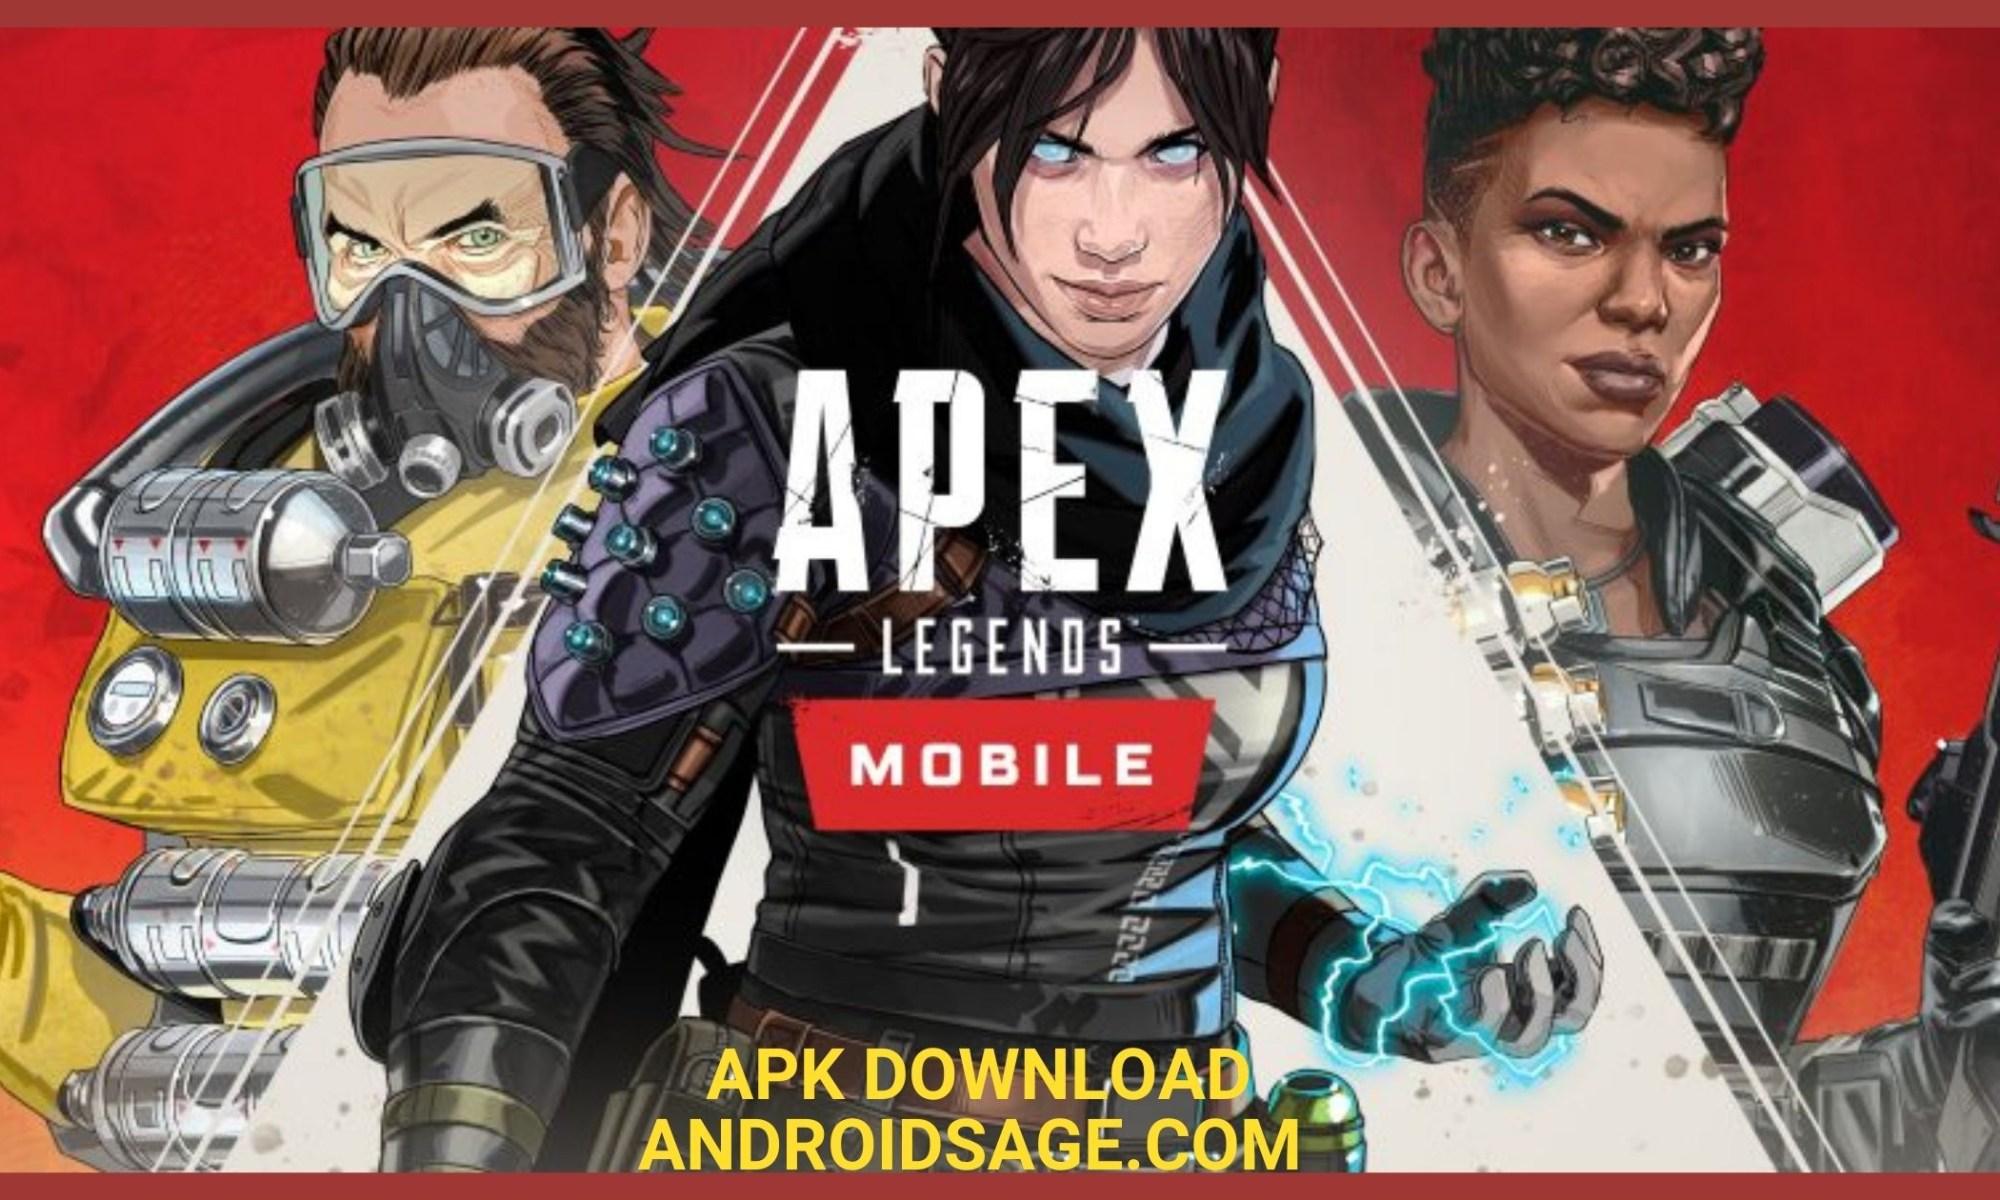 Apex Legends Mobile Beta 3 APK Download